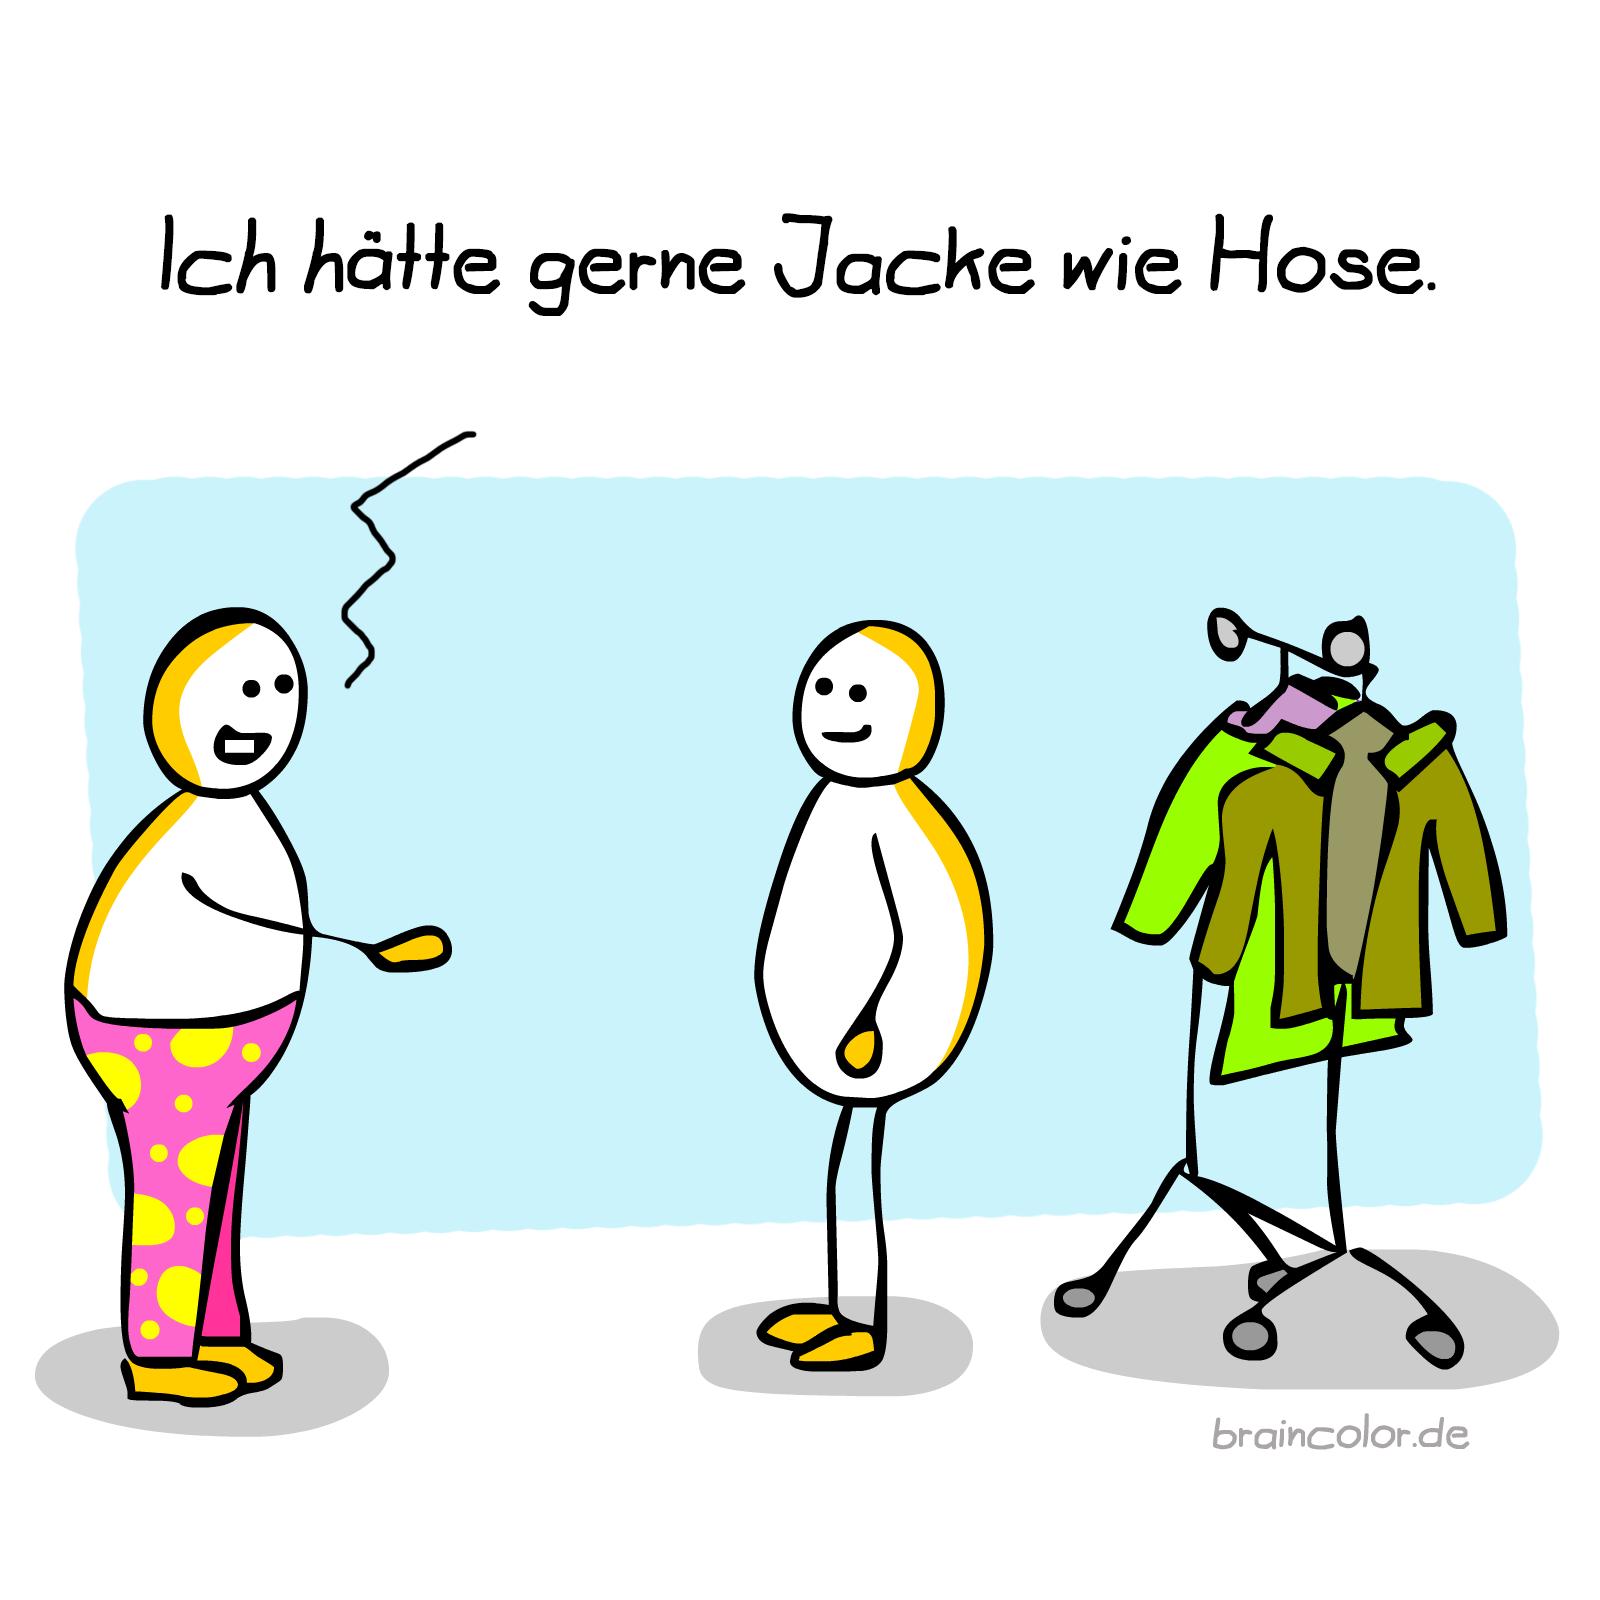 Jacke wie Hose